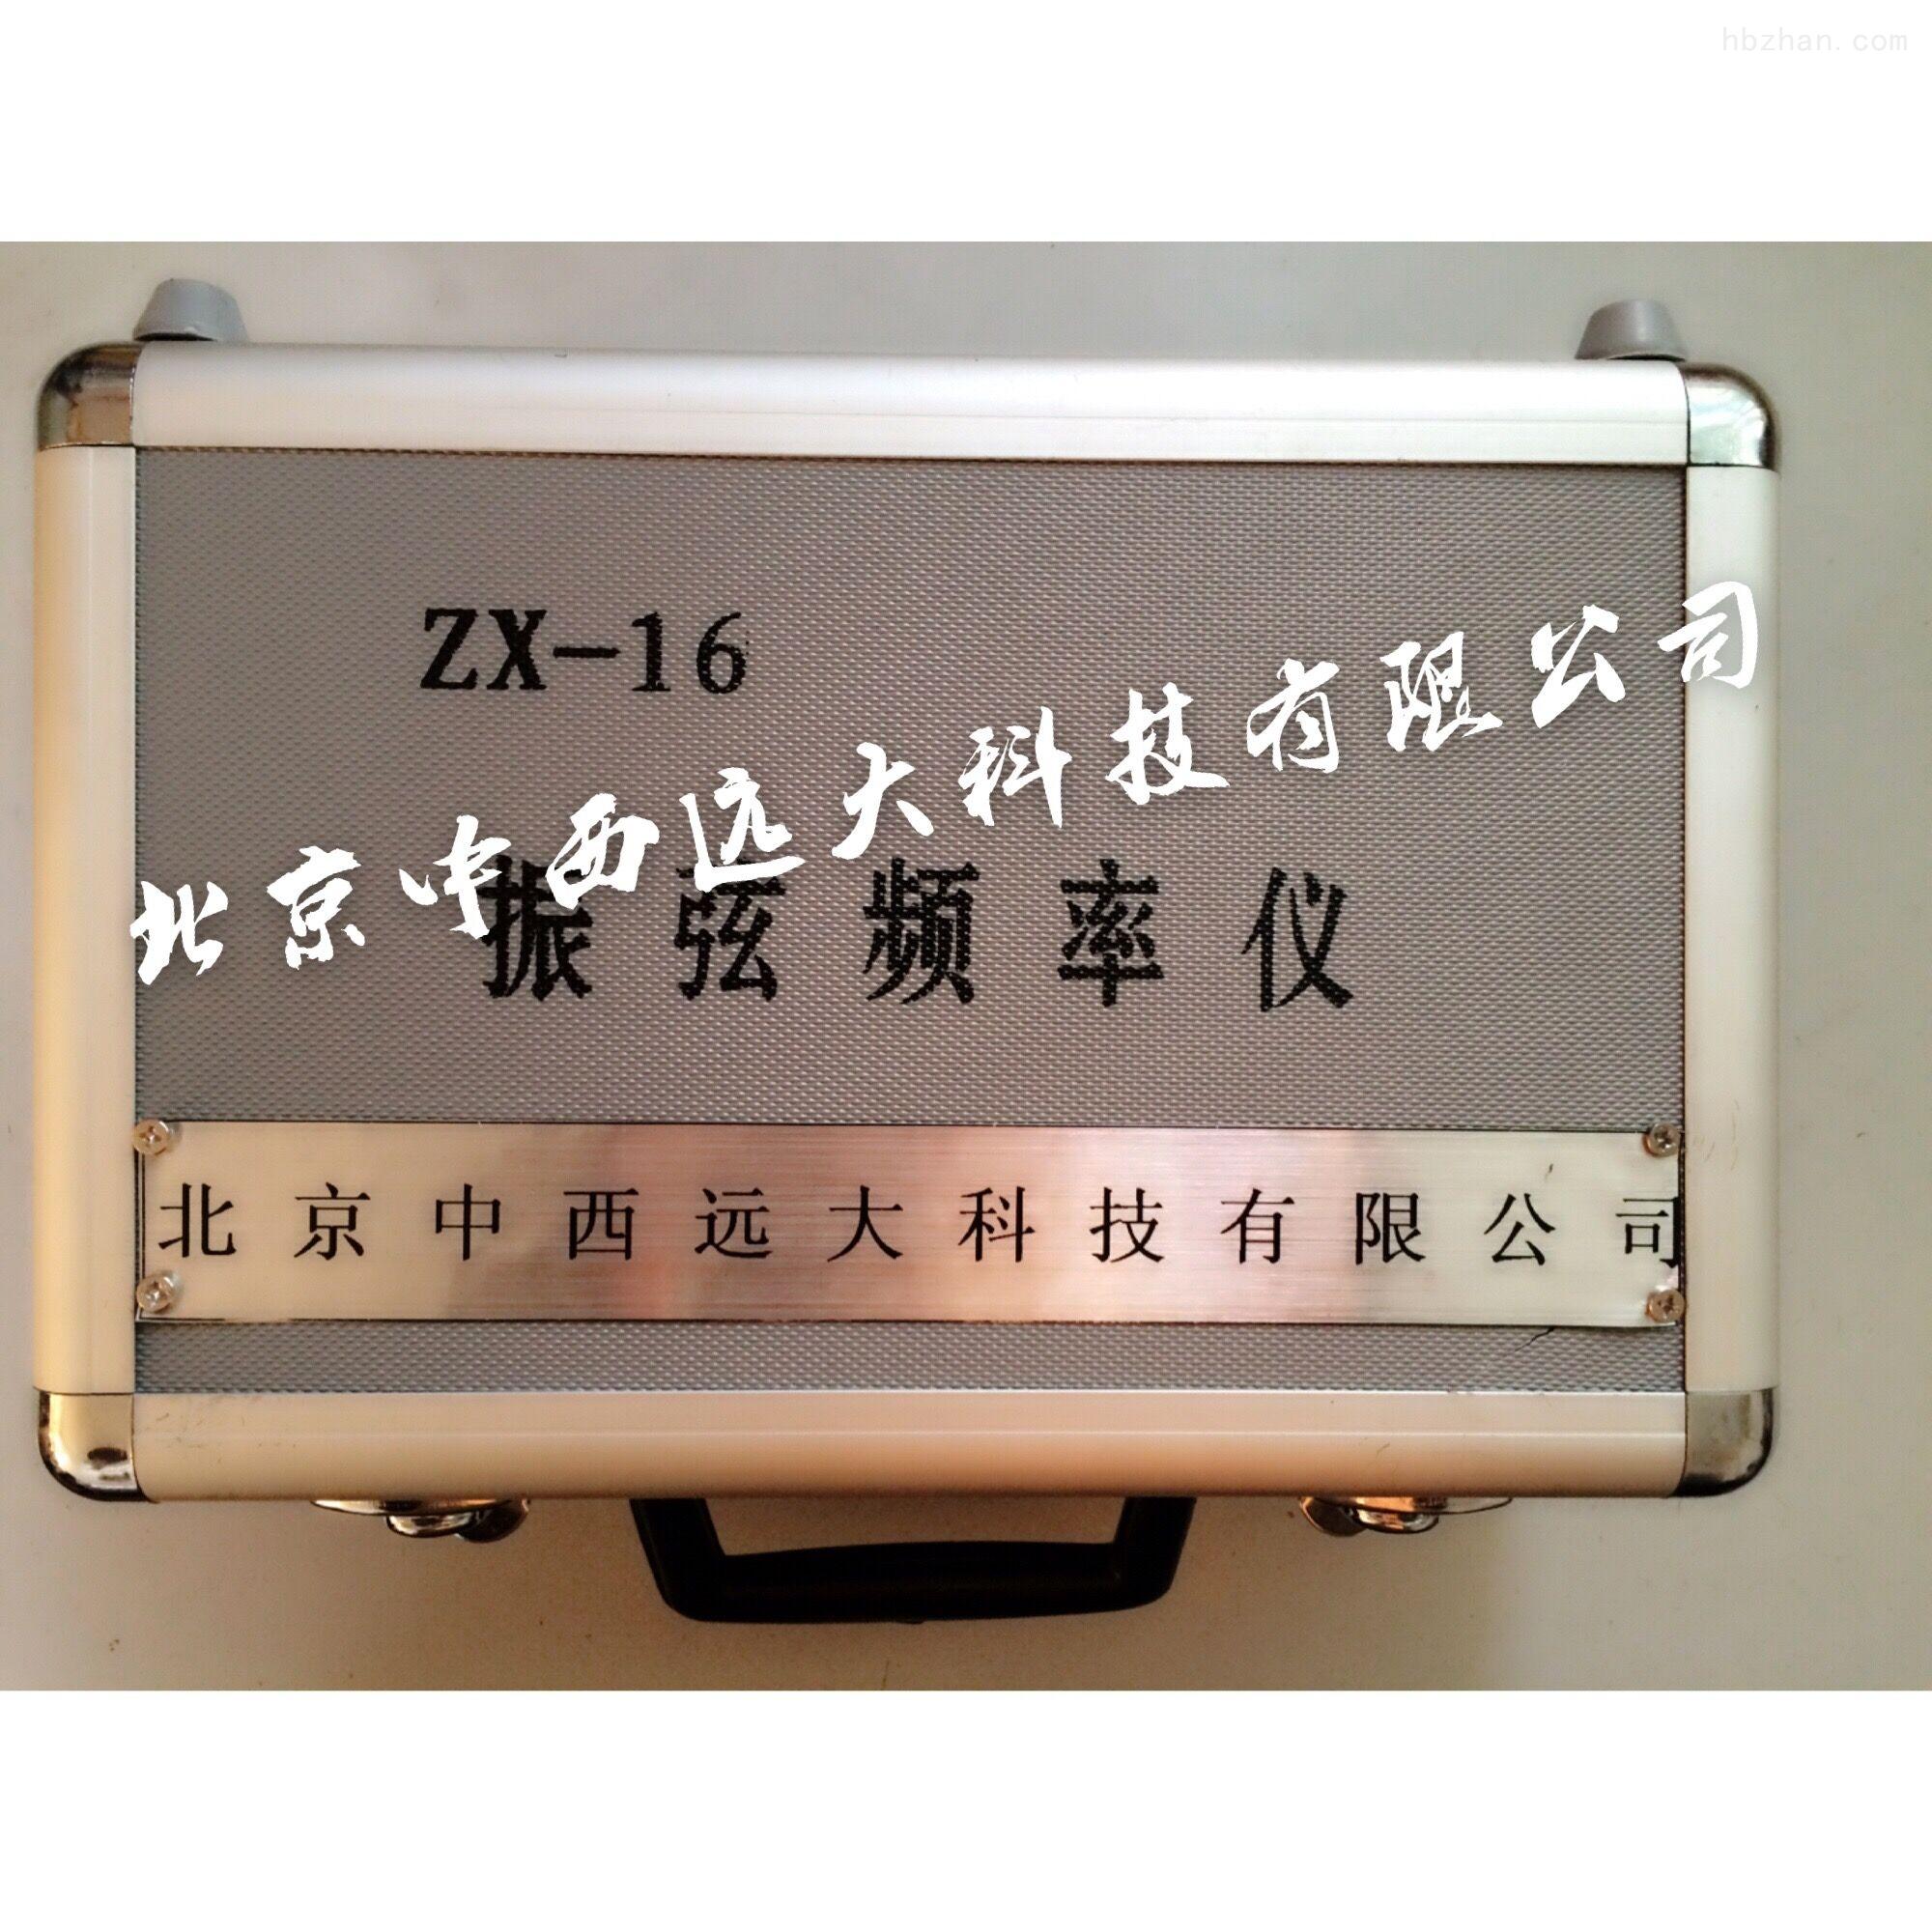 zx-16/byb—100表面应变计用于测量混凝土或其它钢性结构表面的